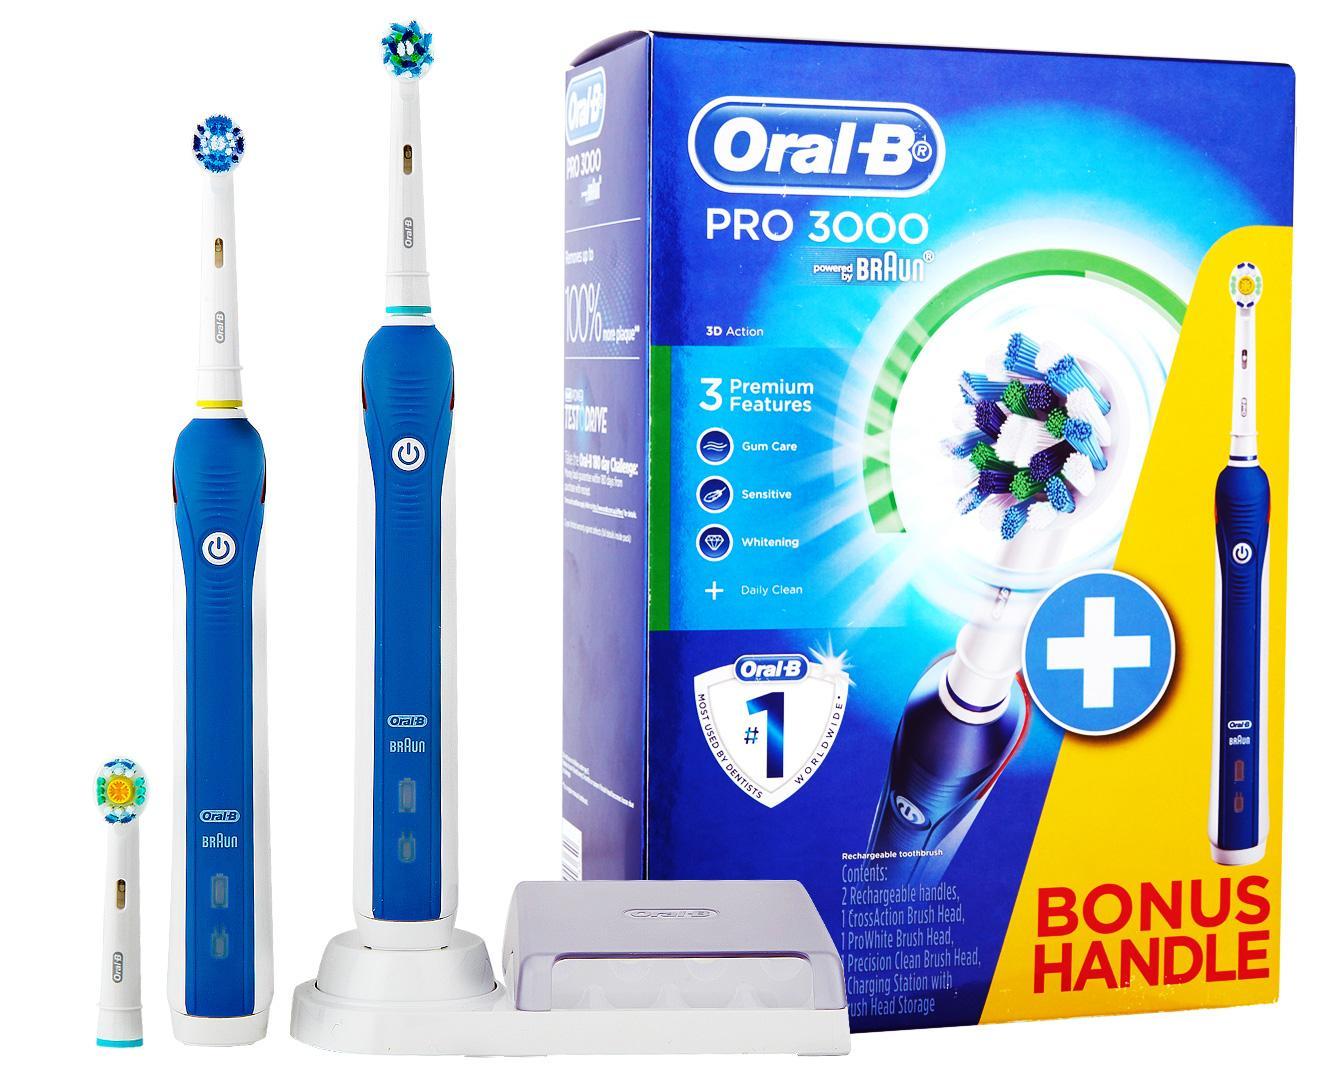 Best Oral B Pro 3000 Power Toothbrush Kit Bonus Handle